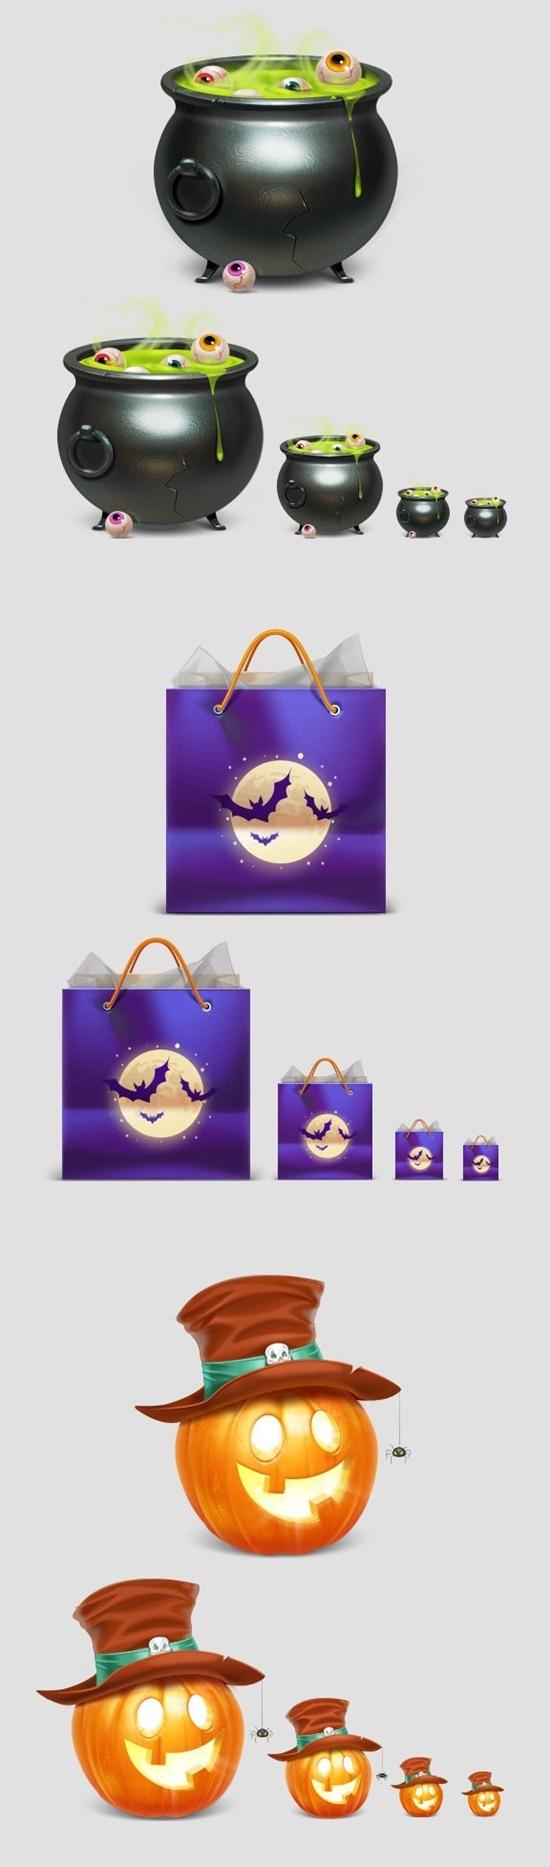 halloween-icon-pack